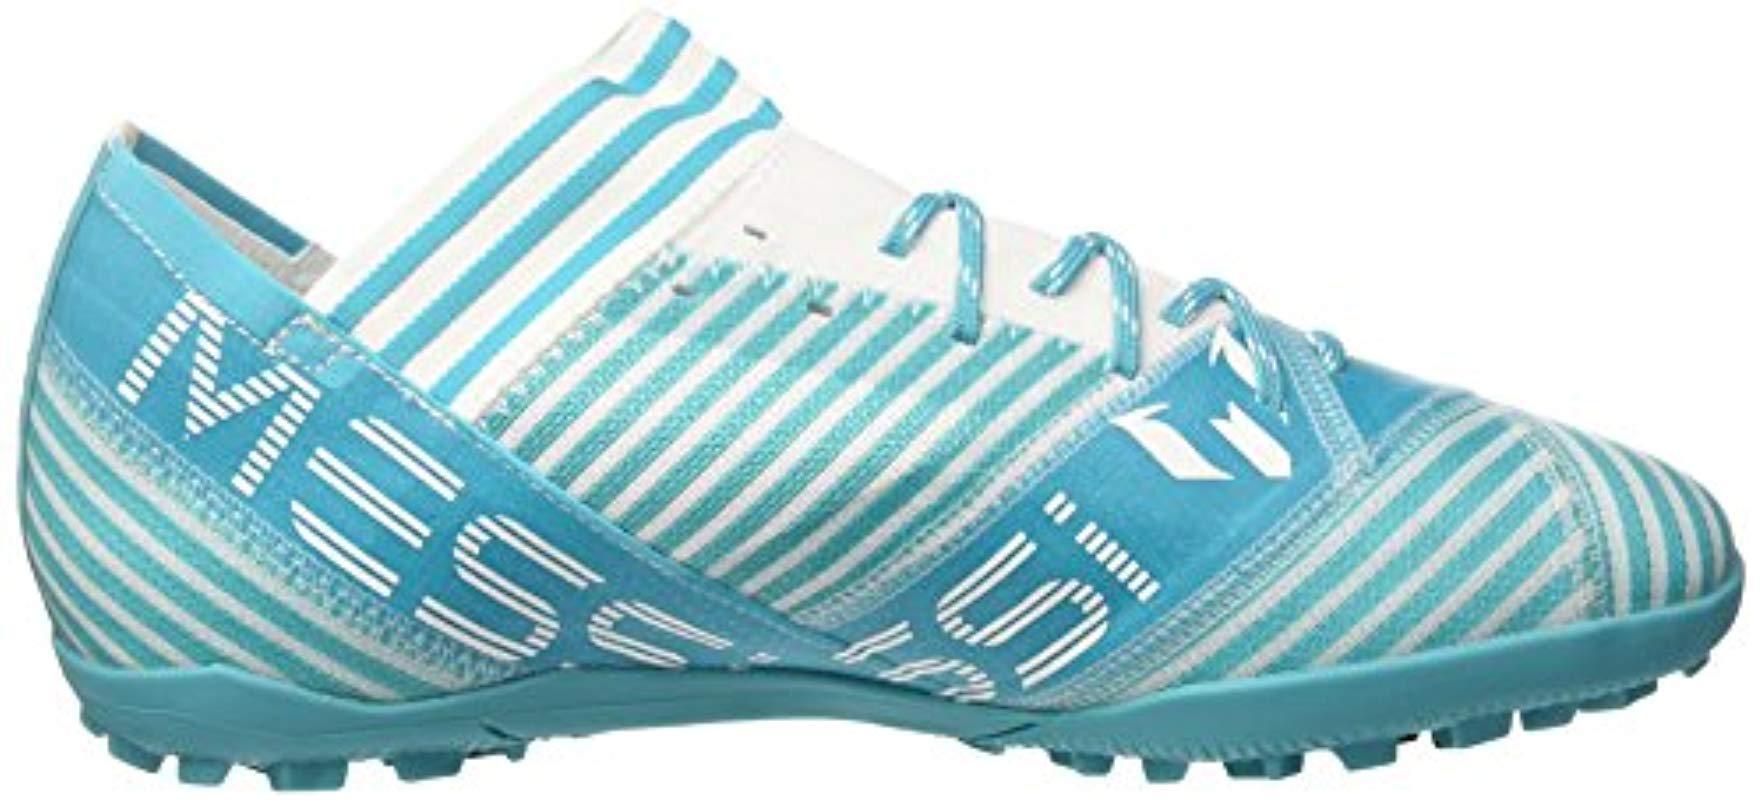 adidas Nemeziz Messi Tango 73 Tf Footbal Shoes in Blue for Men